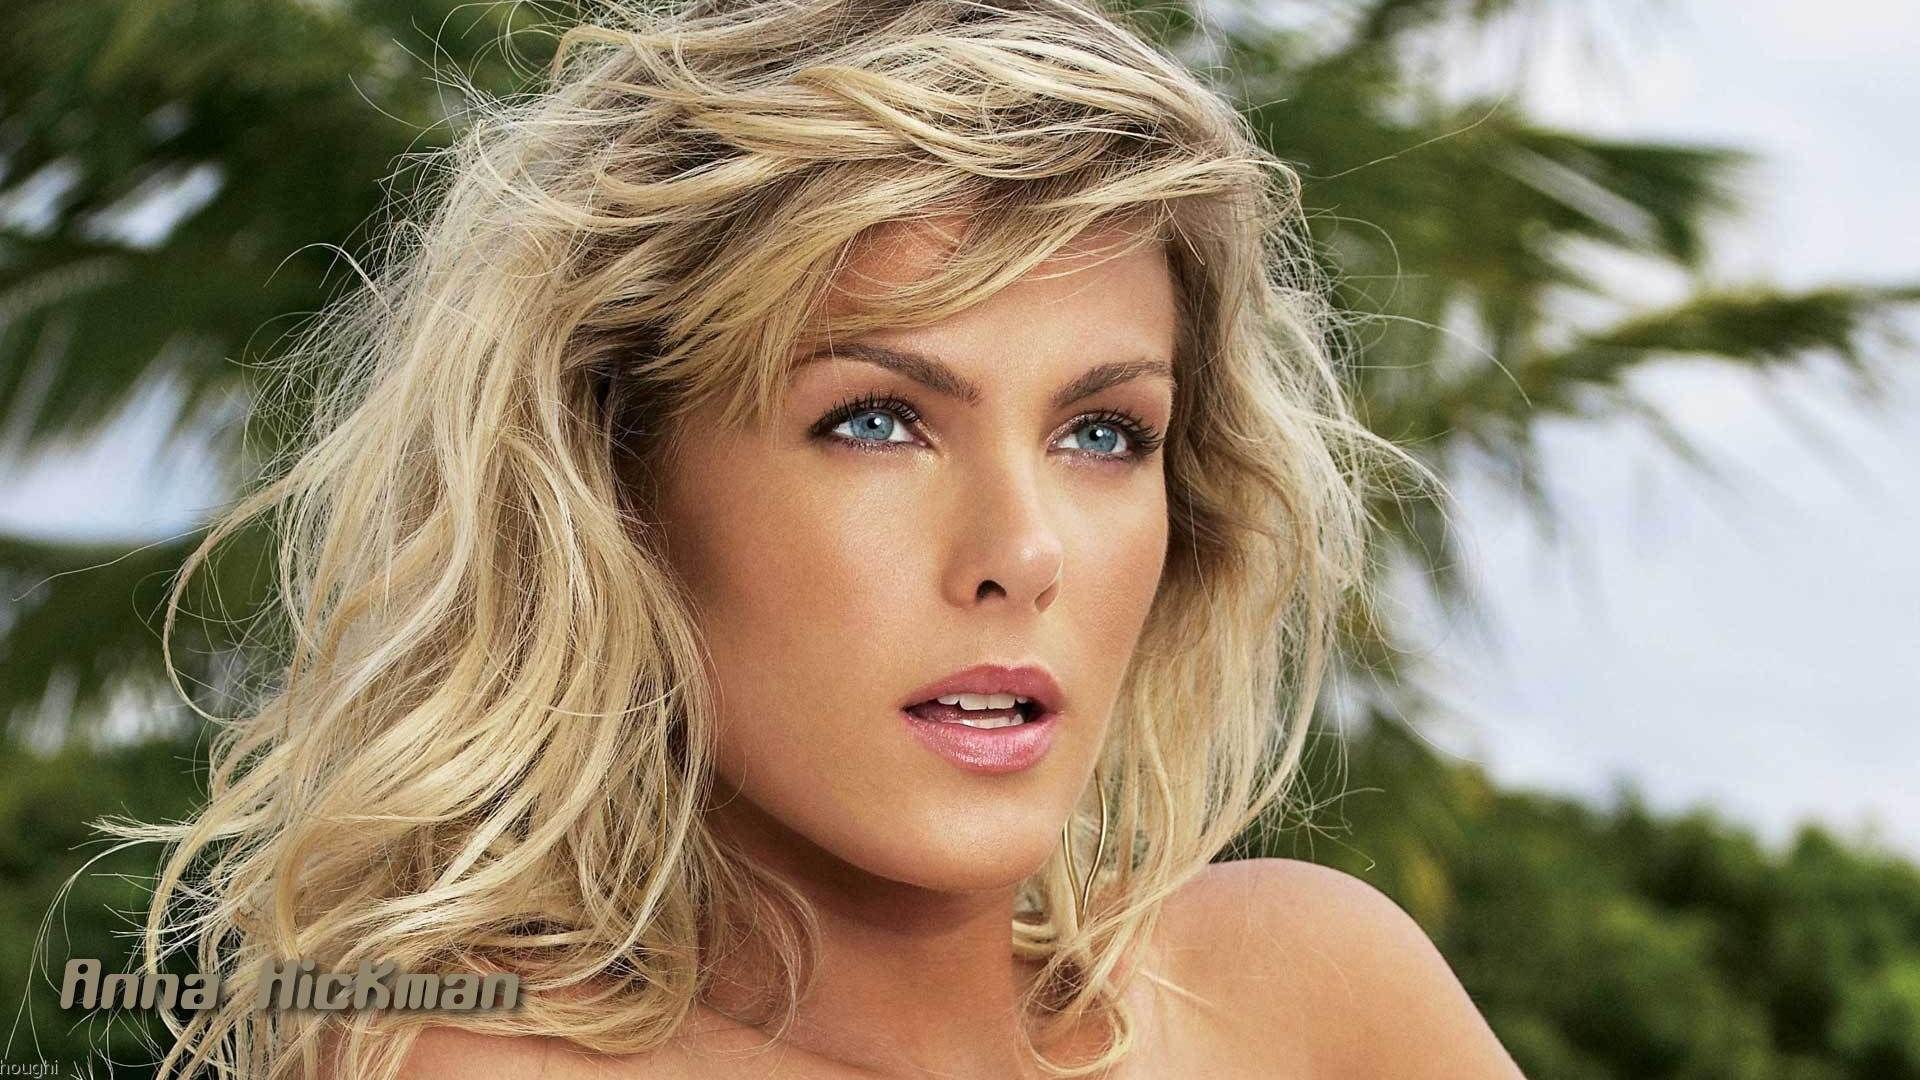 Jolene Anderson born May 26, 1980 (age 38) Jolene Anderson born May 26, 1980 (age 38) new photo